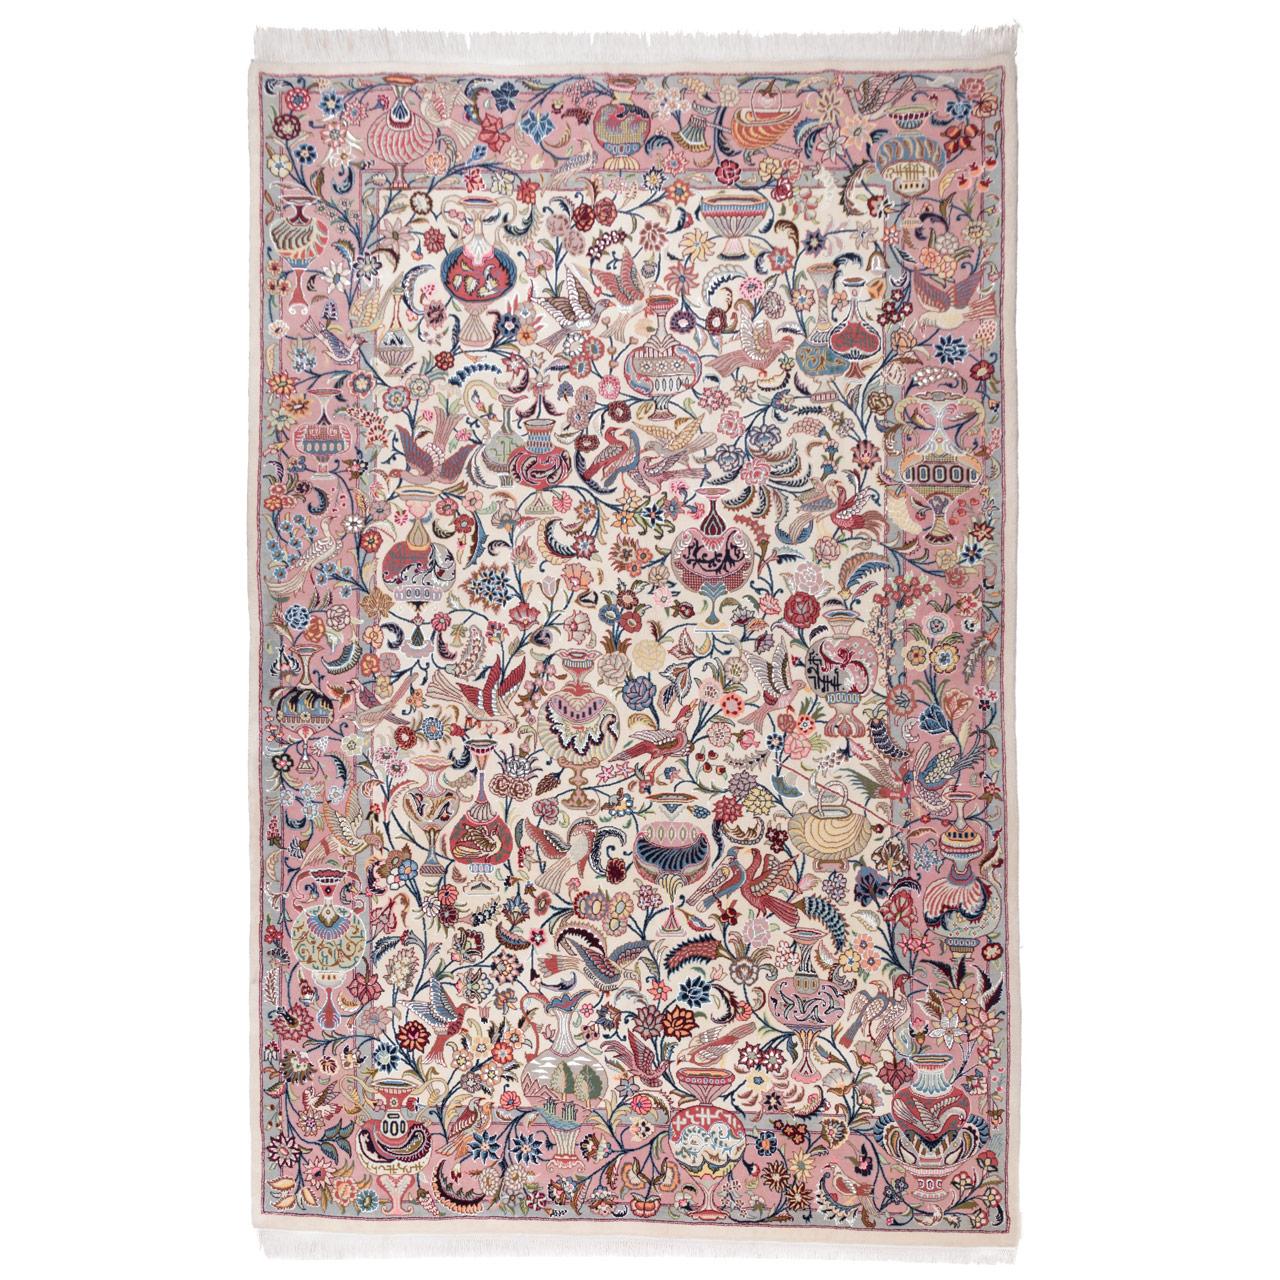 فرش دستباف شش متری سی پرشیا کد ۱۷۰۰۱۶